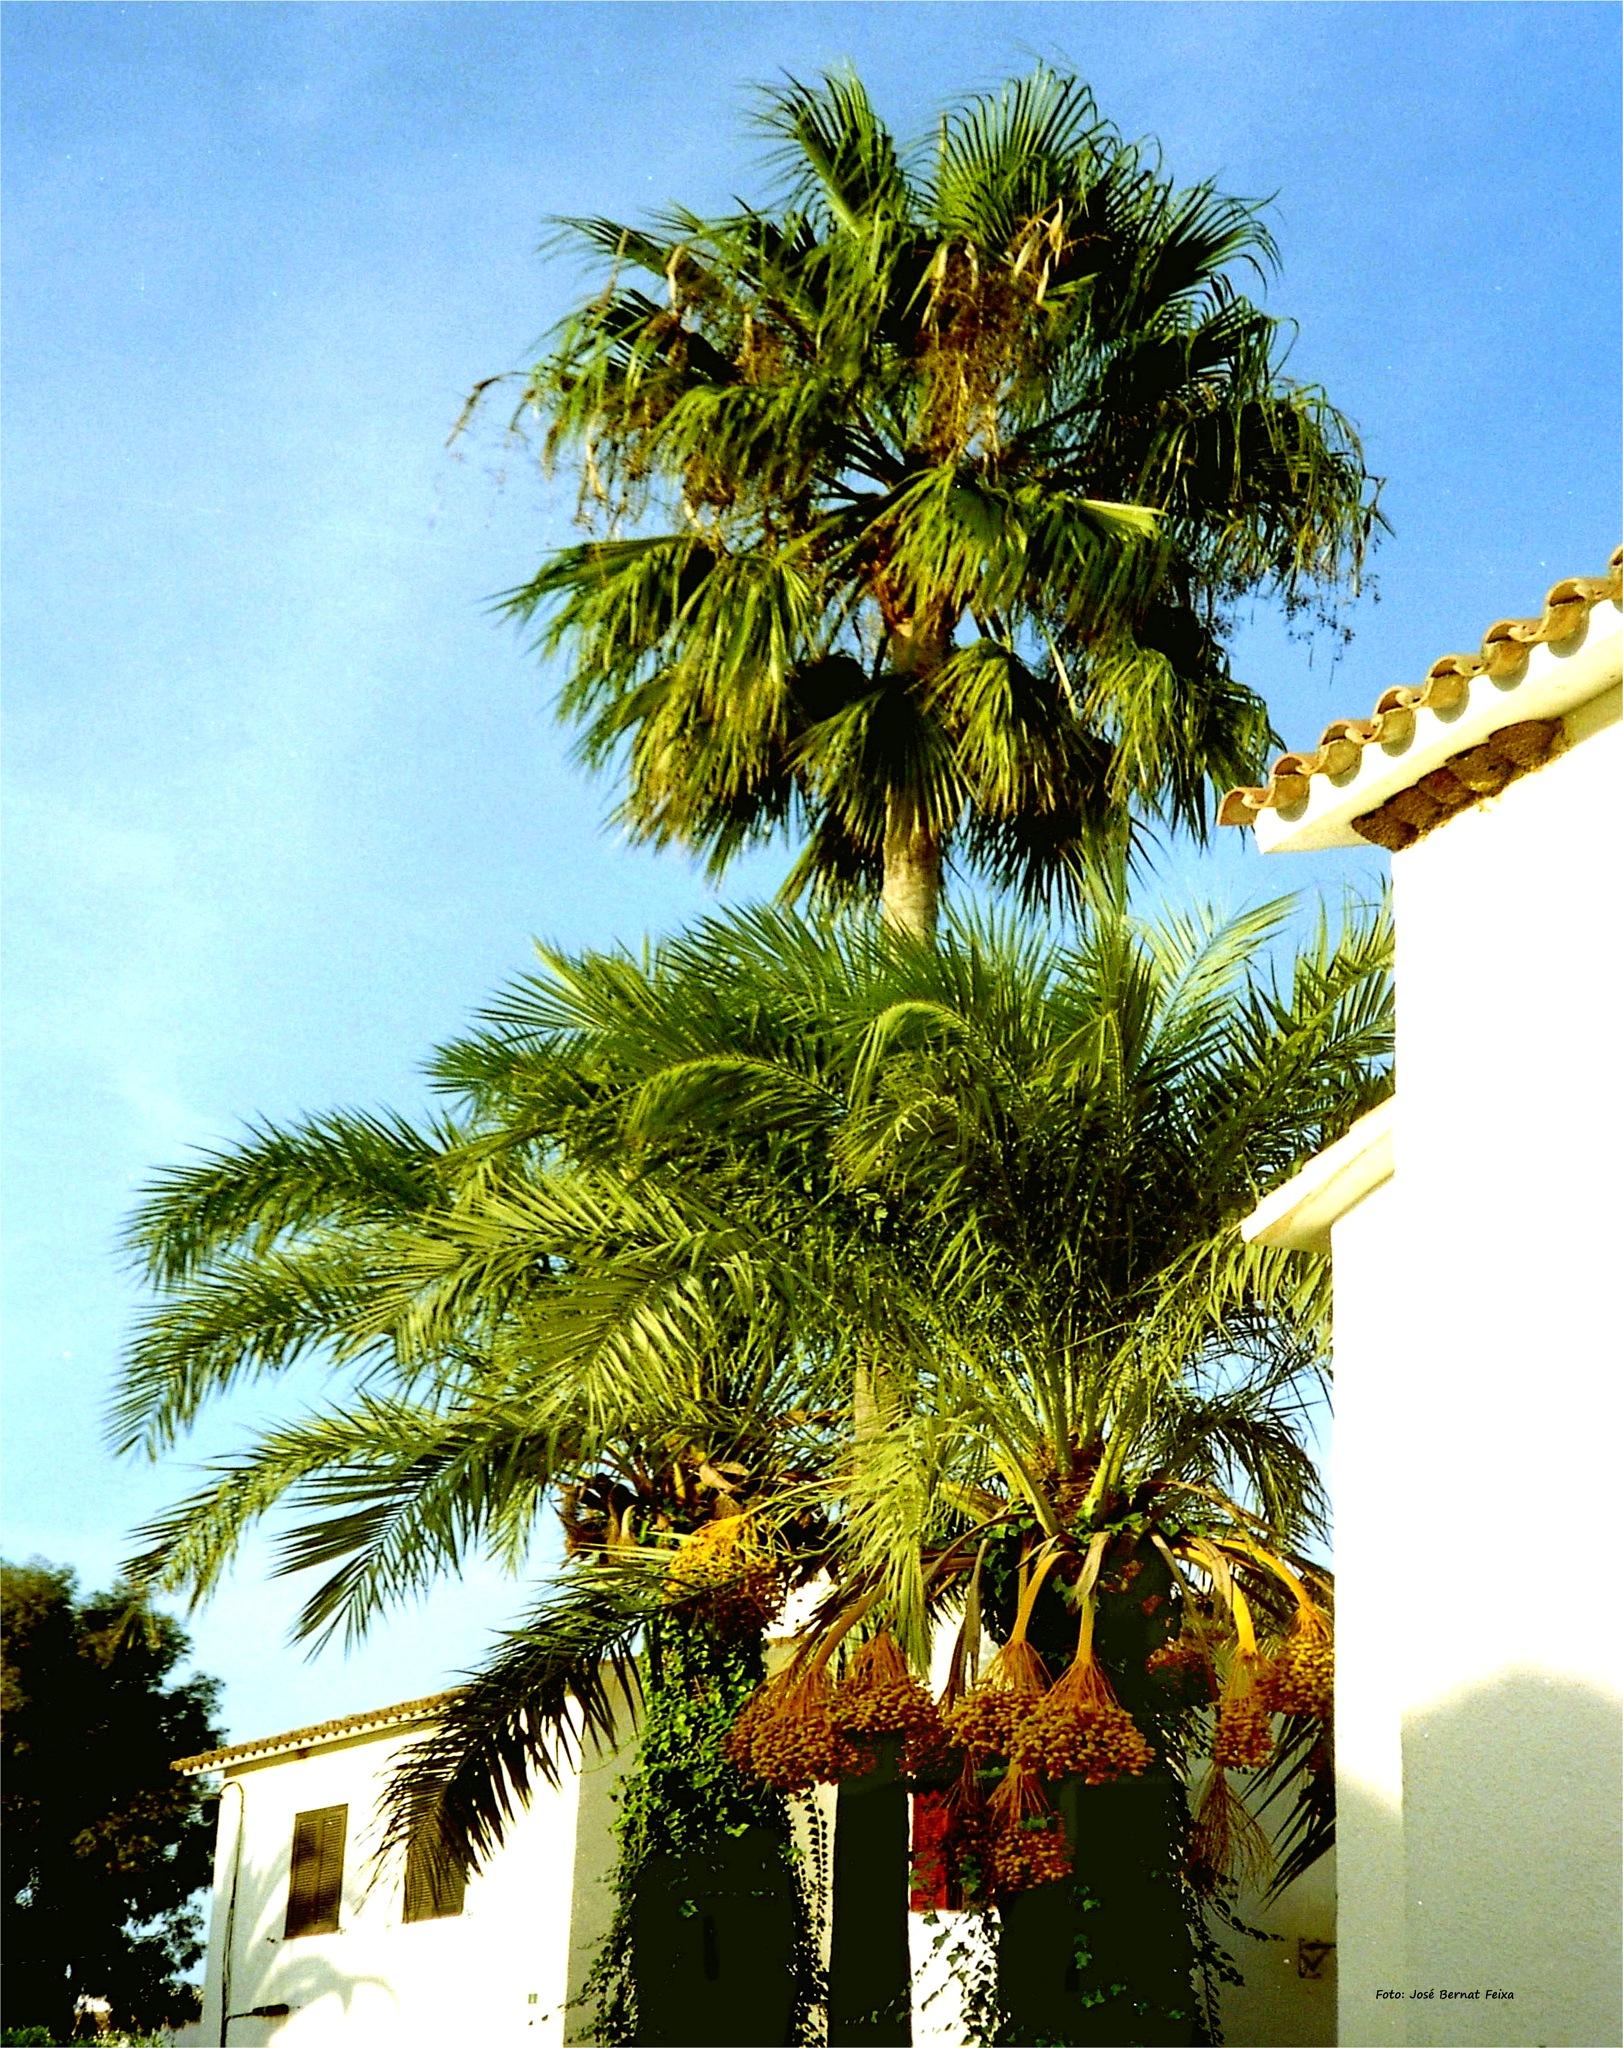 PALMERAS ; PALMBOMEN ; PALM TREES by José Bernat Feixa